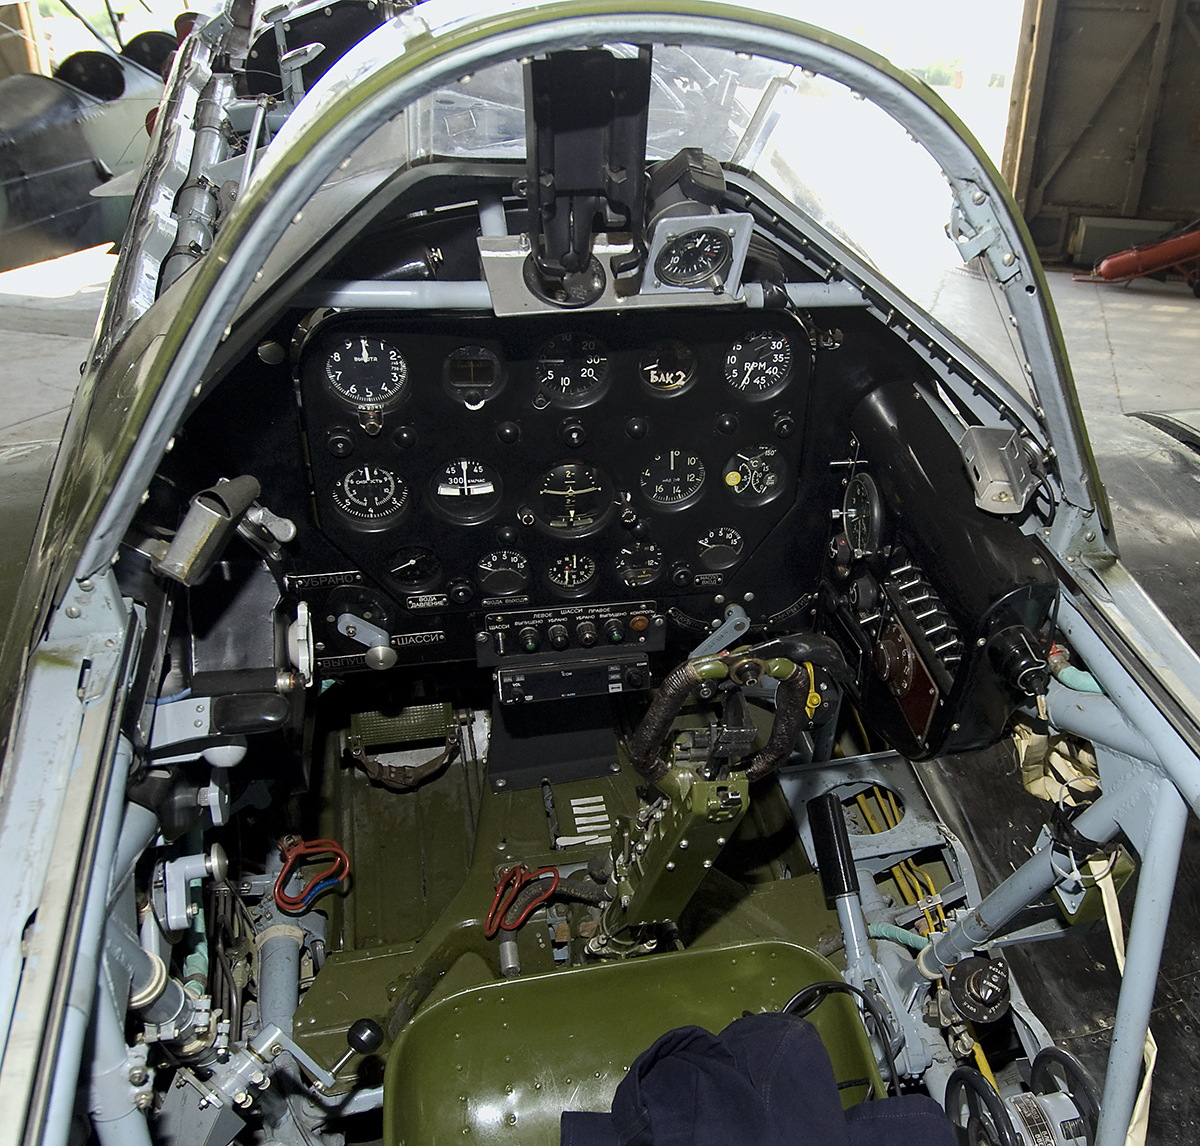 File:Mig-3(65).Cockpit (6049529601).jpg - Wikimedia Commons